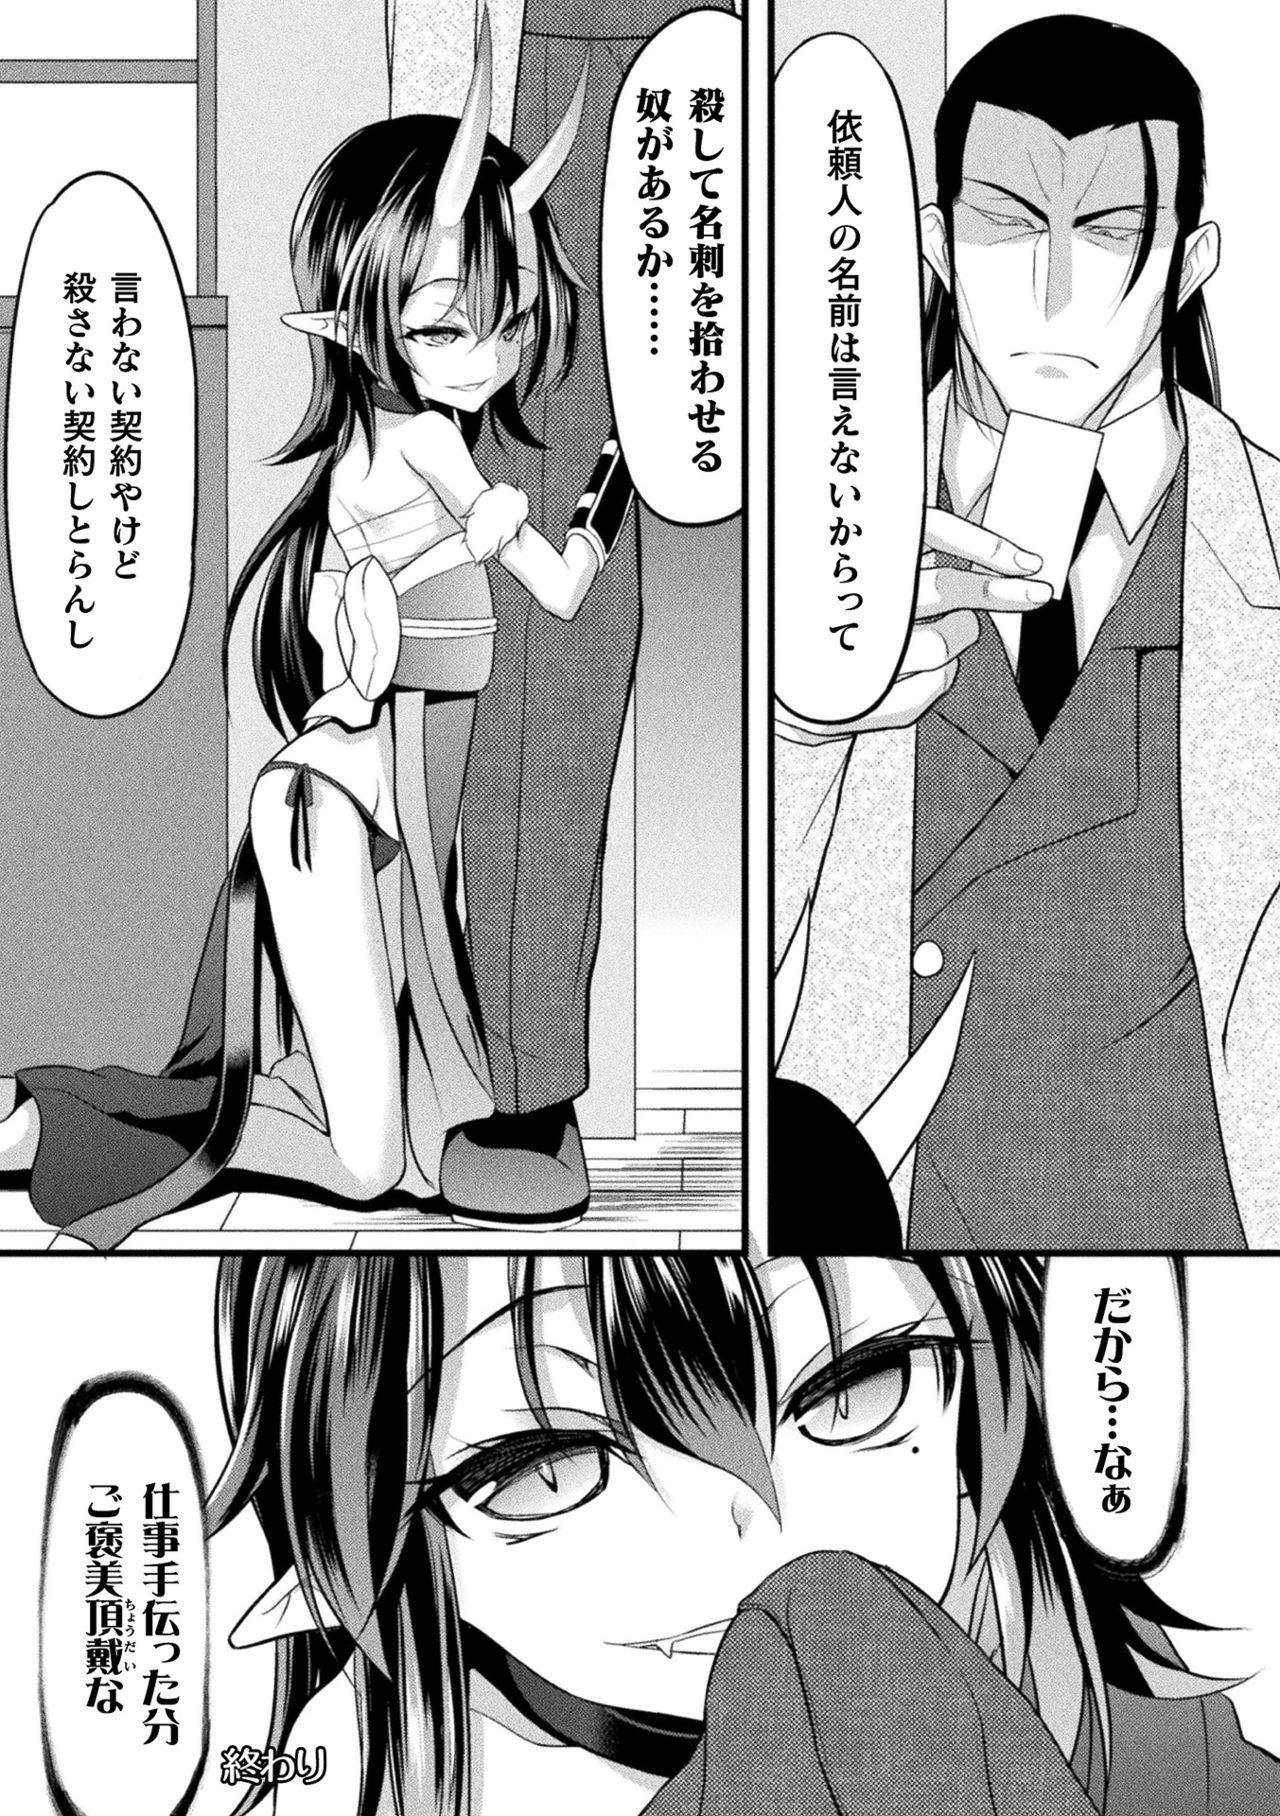 Loli-babaa Kyousei Tanetsuke Ecchi! Vol. 2 43